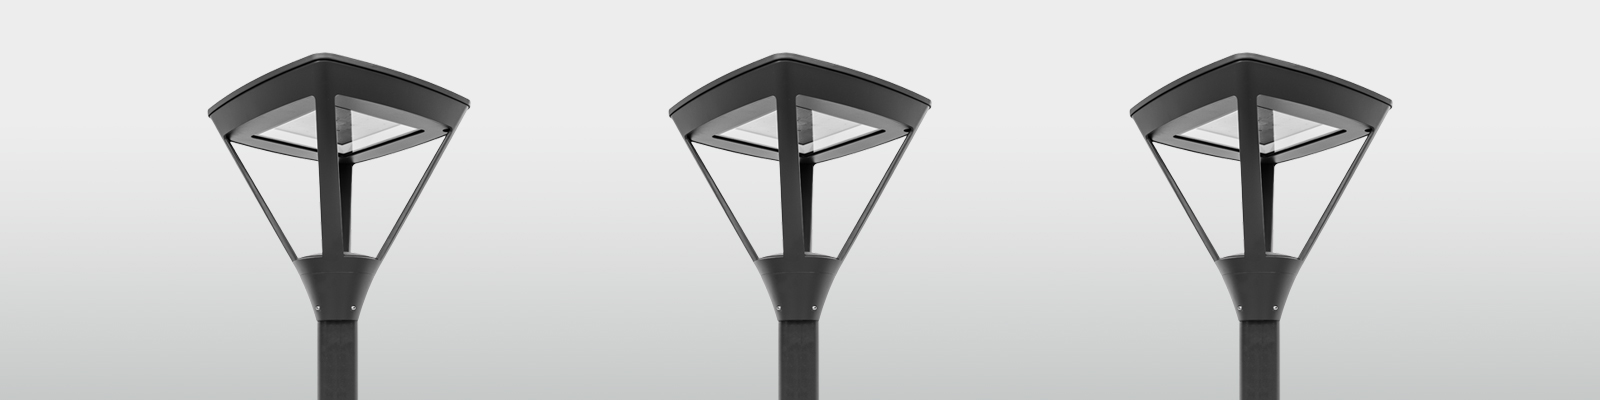 ALSL Luminaria LED Siena - NOVATILU